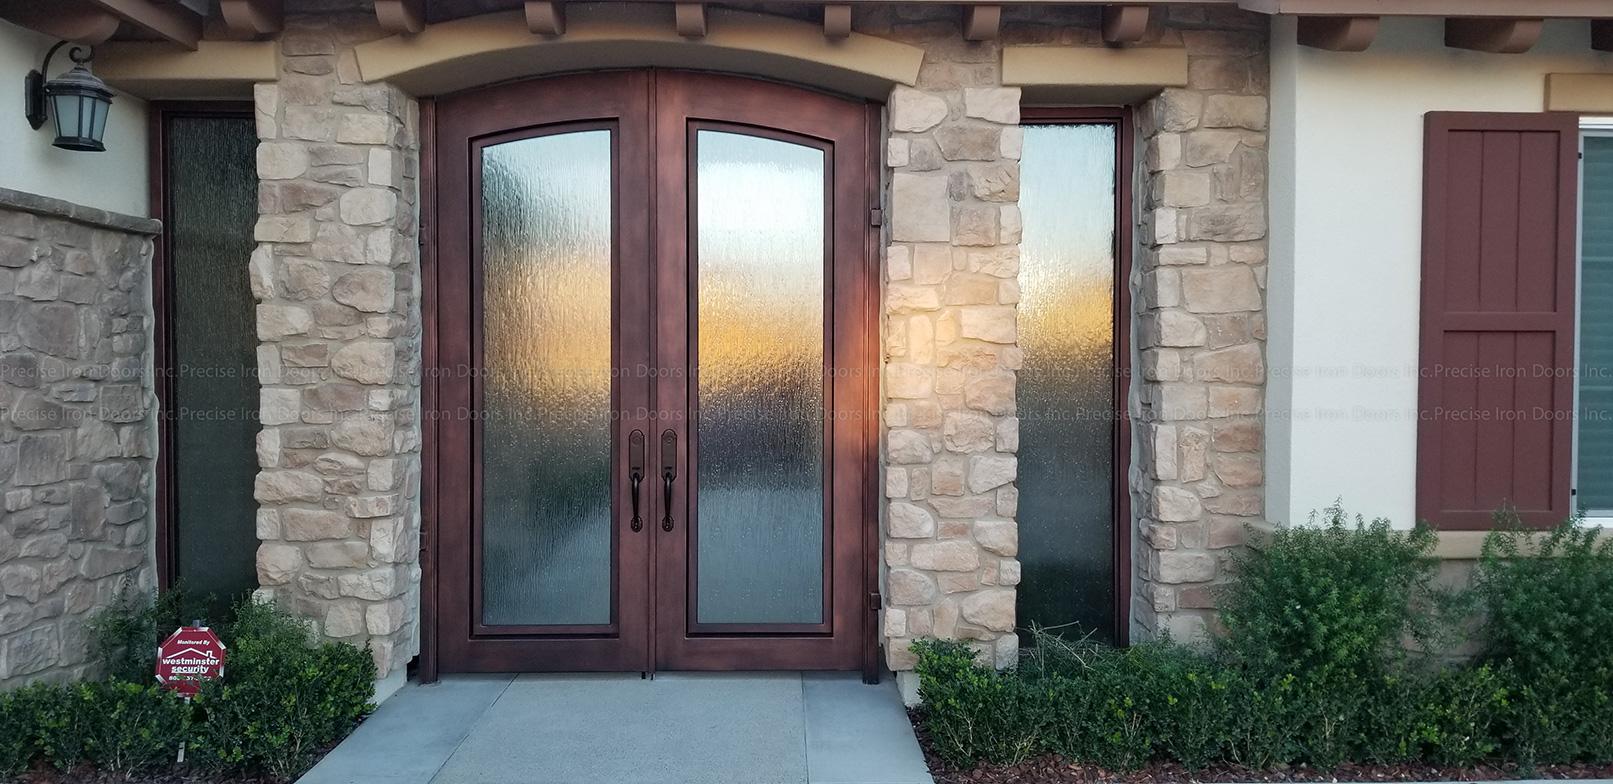 Custom Modern Steel Eyebrow Top Double Doors with Glass Panel